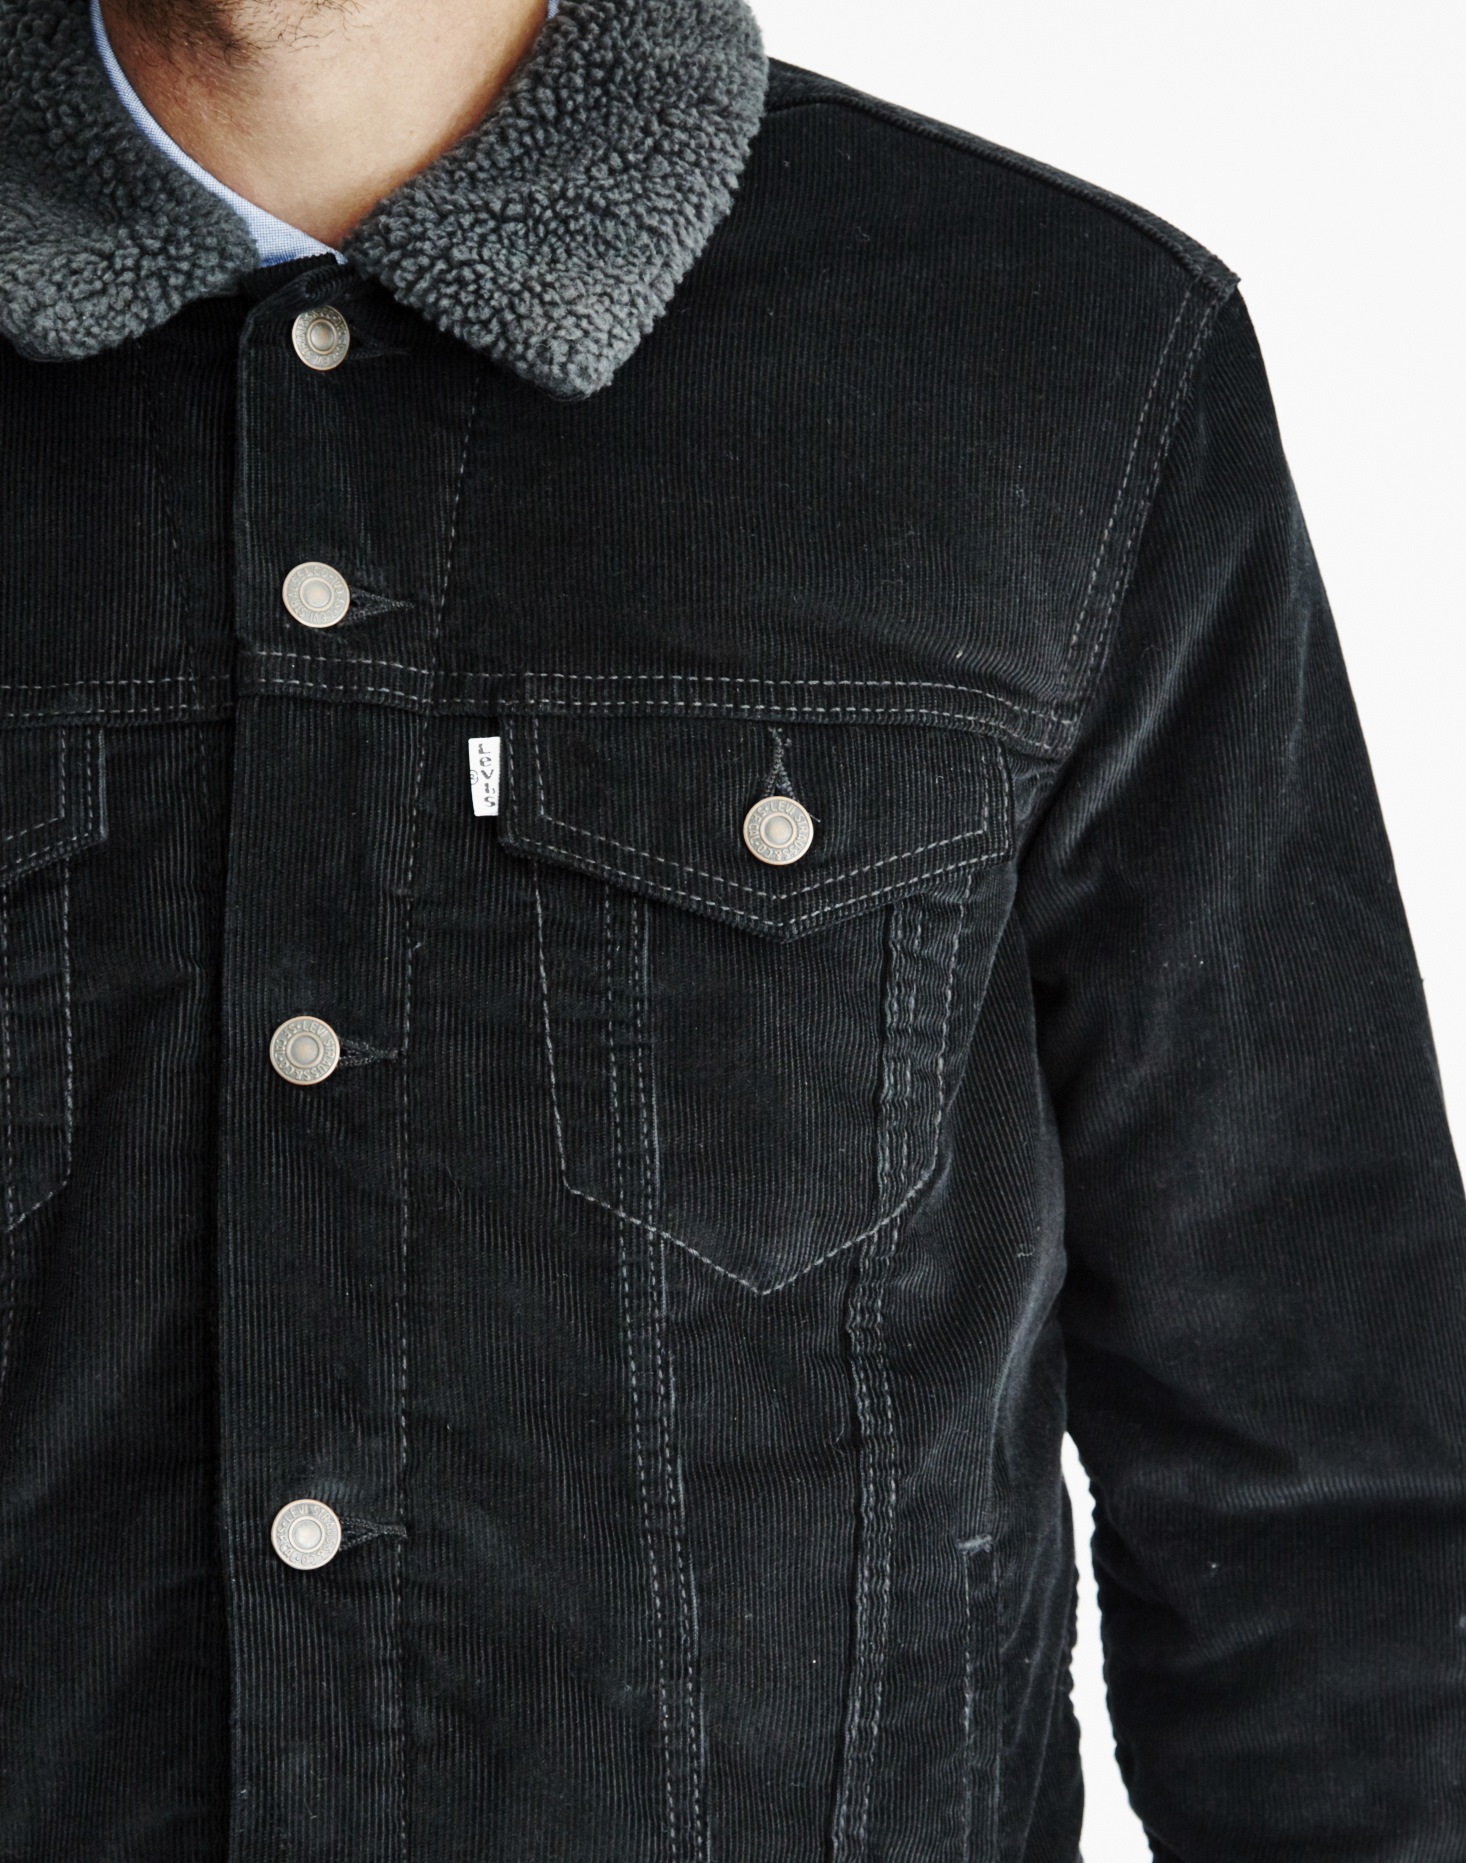 levi 39 s type 3 sherpa trucker jacket black sherpa trucker in black for men lyst. Black Bedroom Furniture Sets. Home Design Ideas